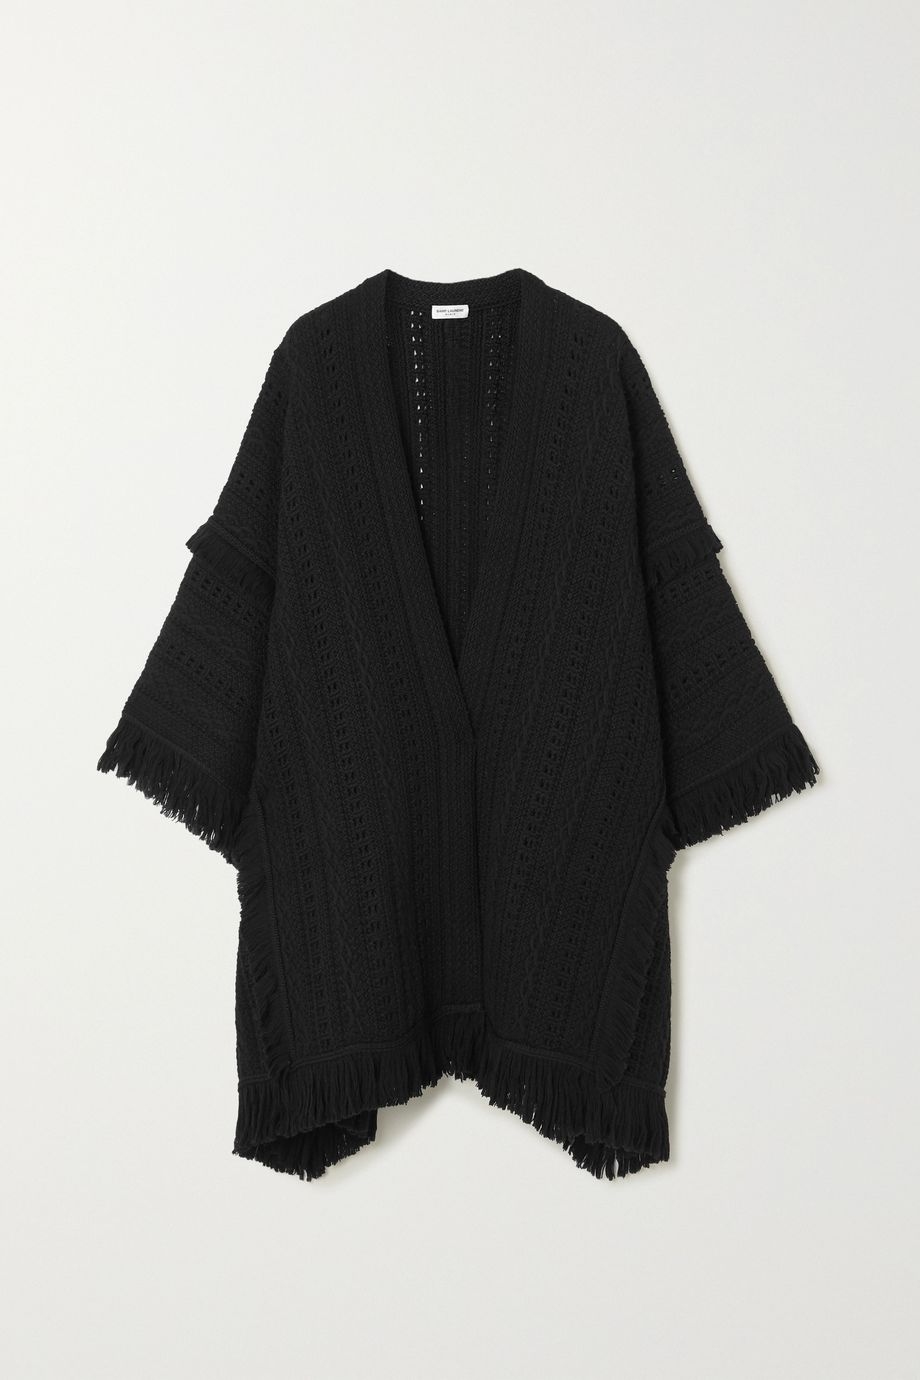 SAINT LAURENT Fringed crochet-knit wool cape